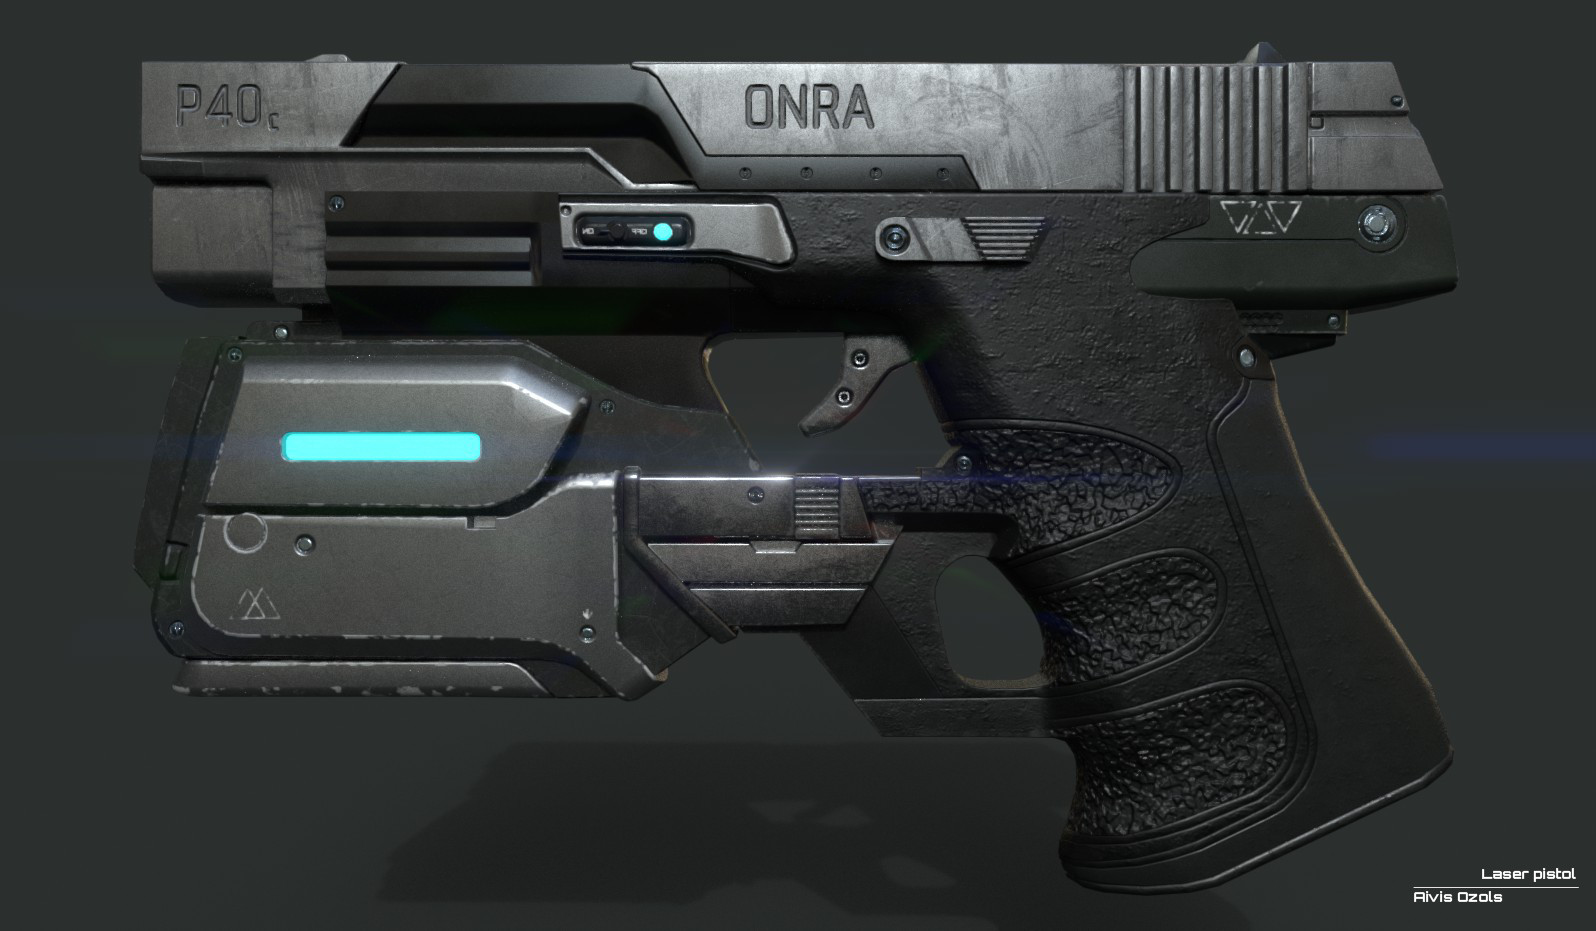 Aivis ozols pistol04